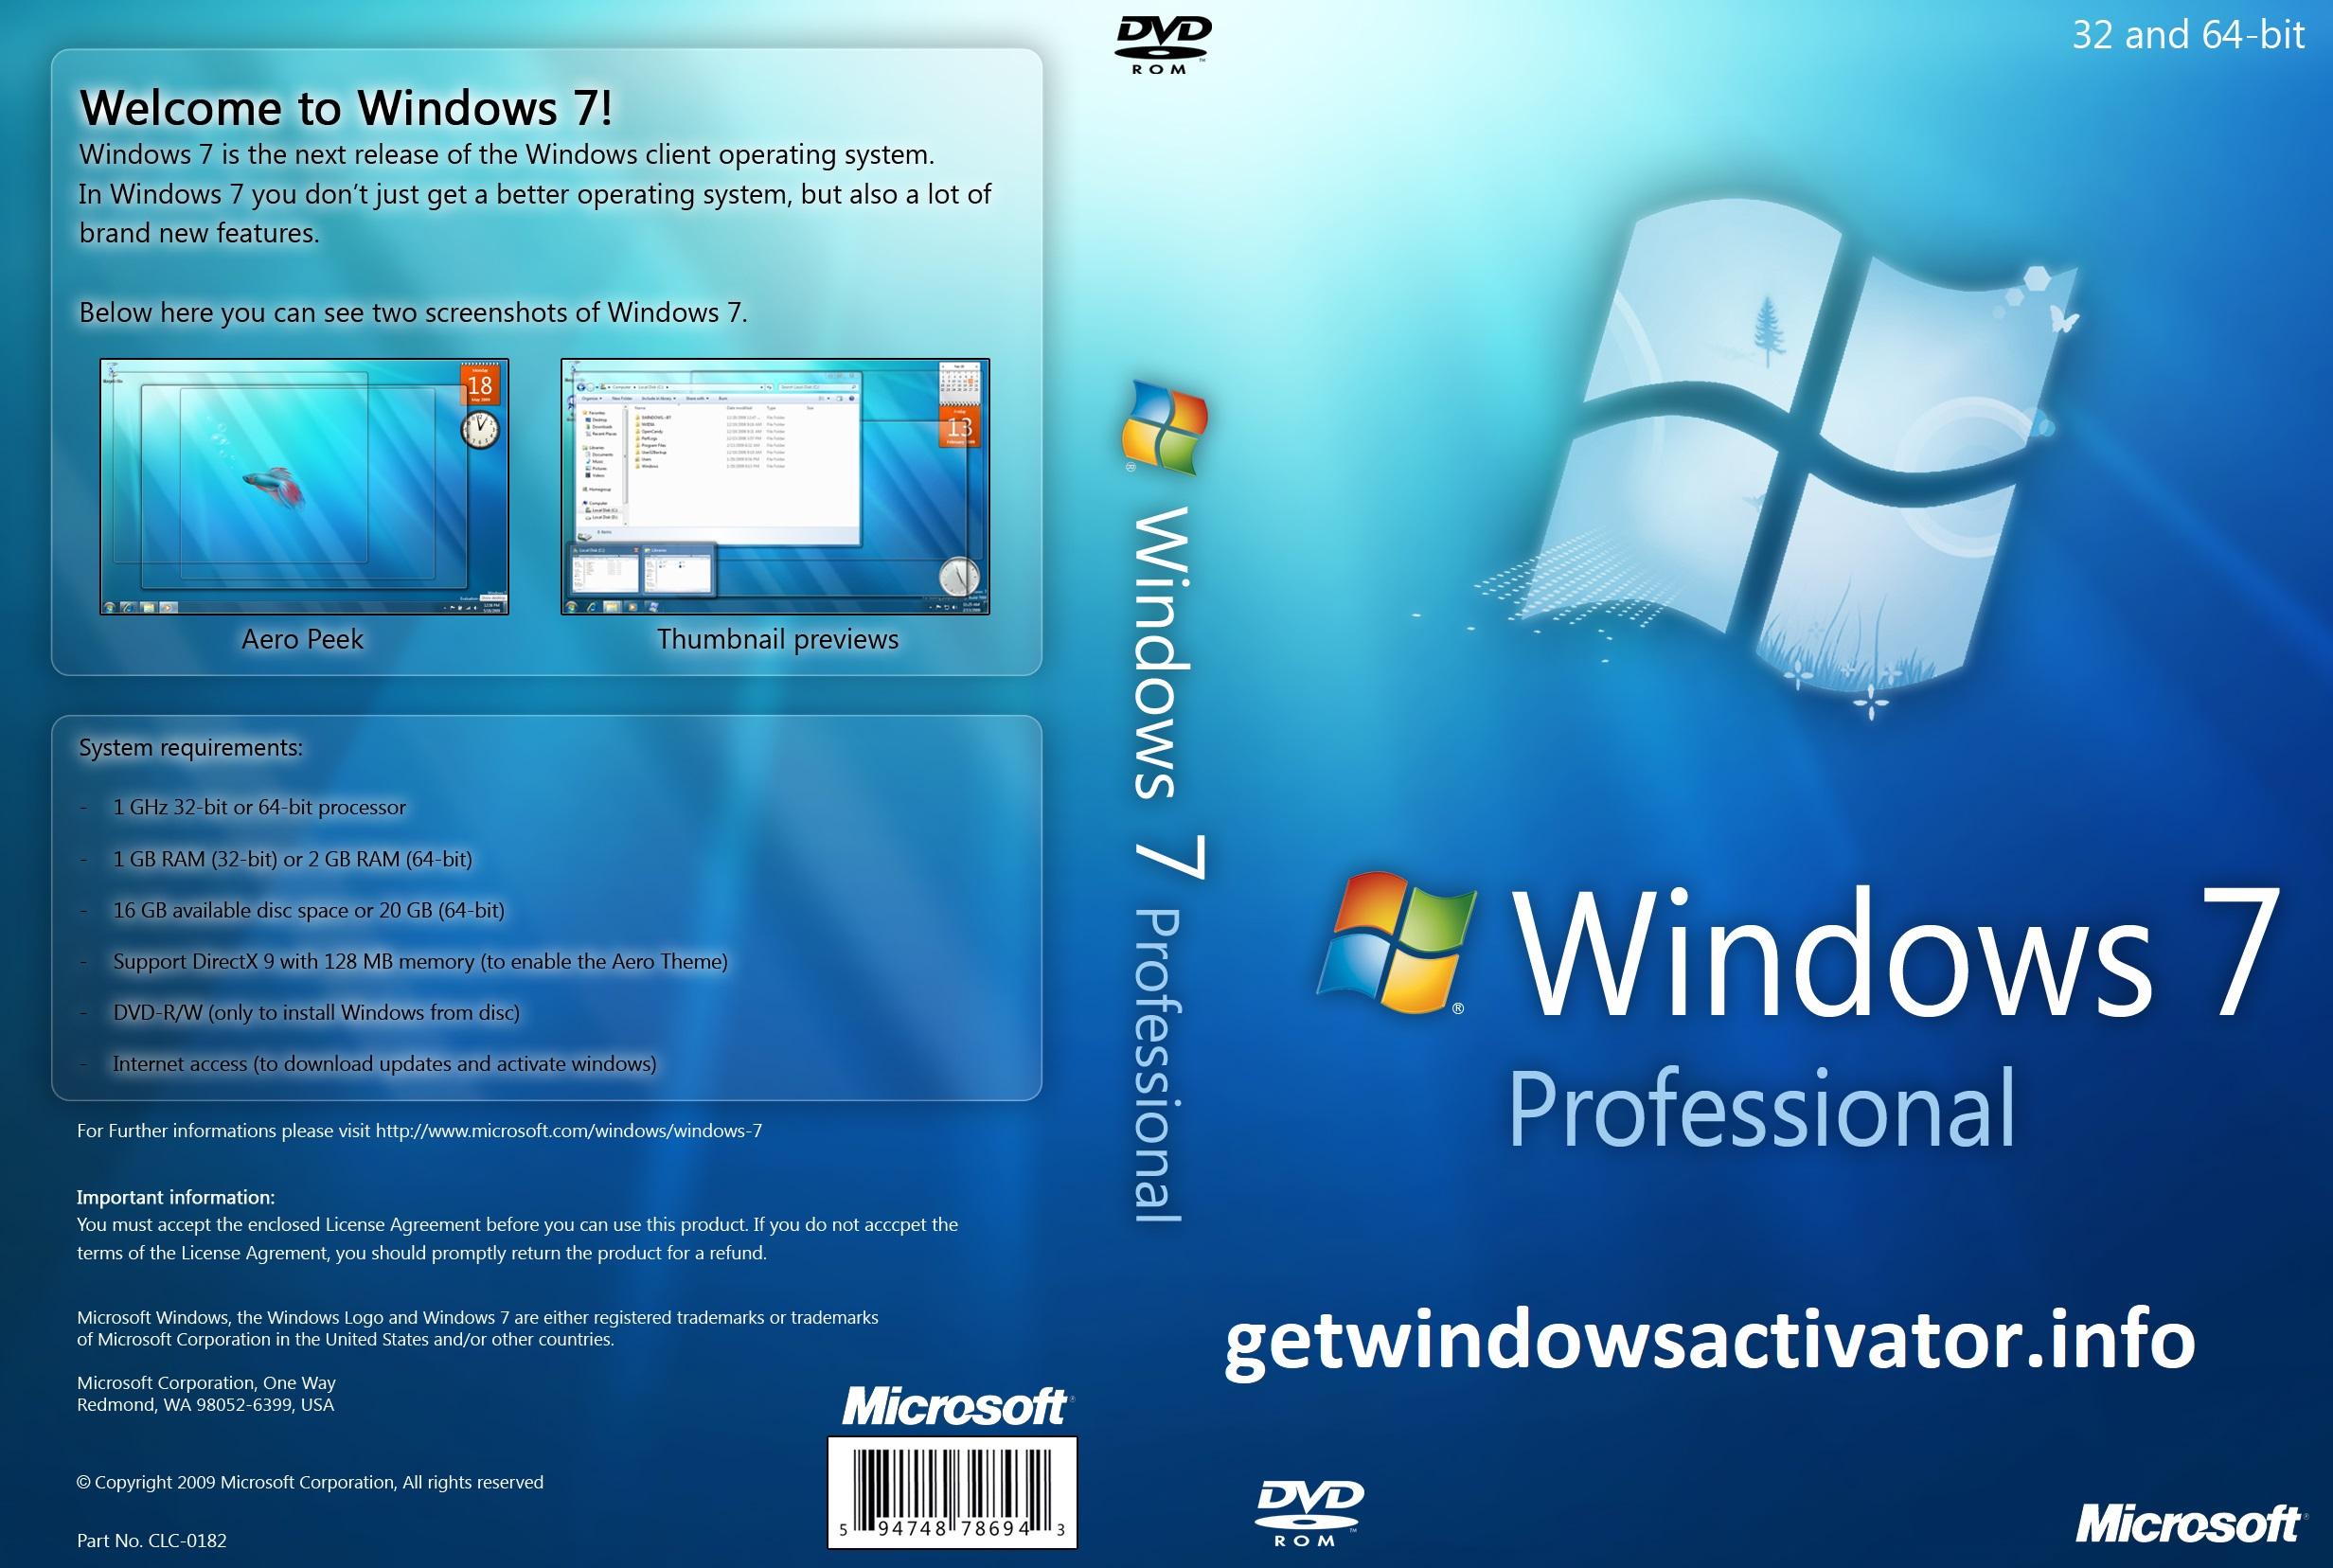 Windows 7 Professional Product Key Free Download ⸤32+64 Bit⸥